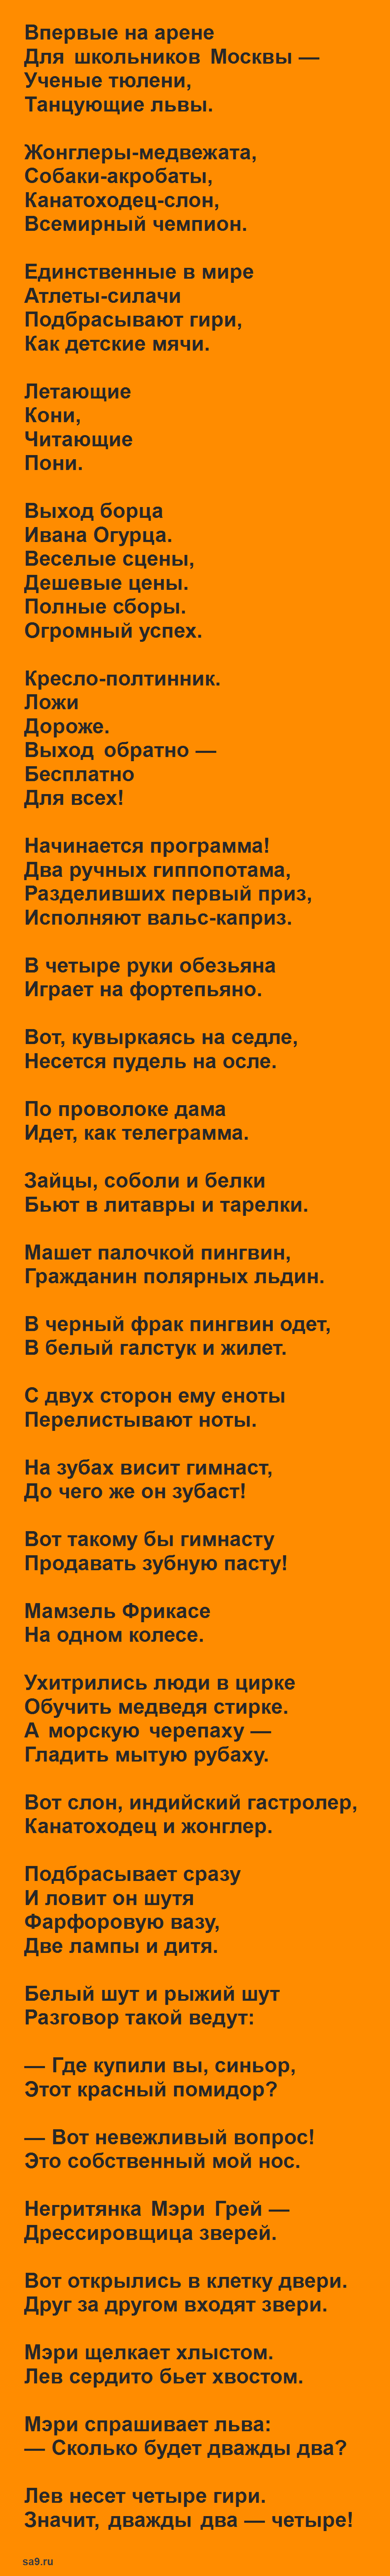 Самуил Маршак стихи - Цирк